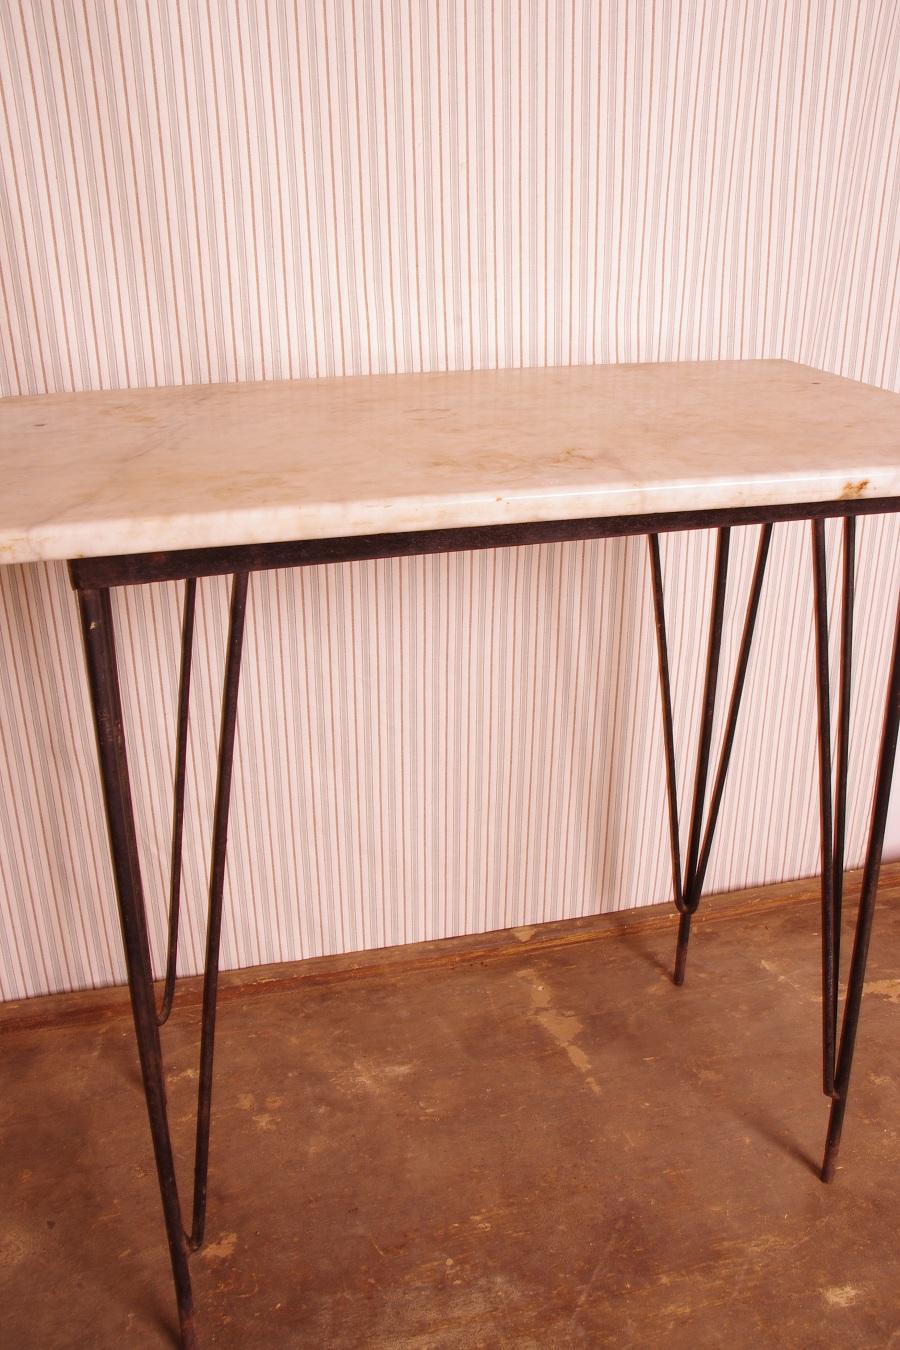 Metal Table Legs Australia Square Frame Table Legs  : IMGP5384 from www.theridgewayinn.com size 900 x 1350 jpeg 470kB